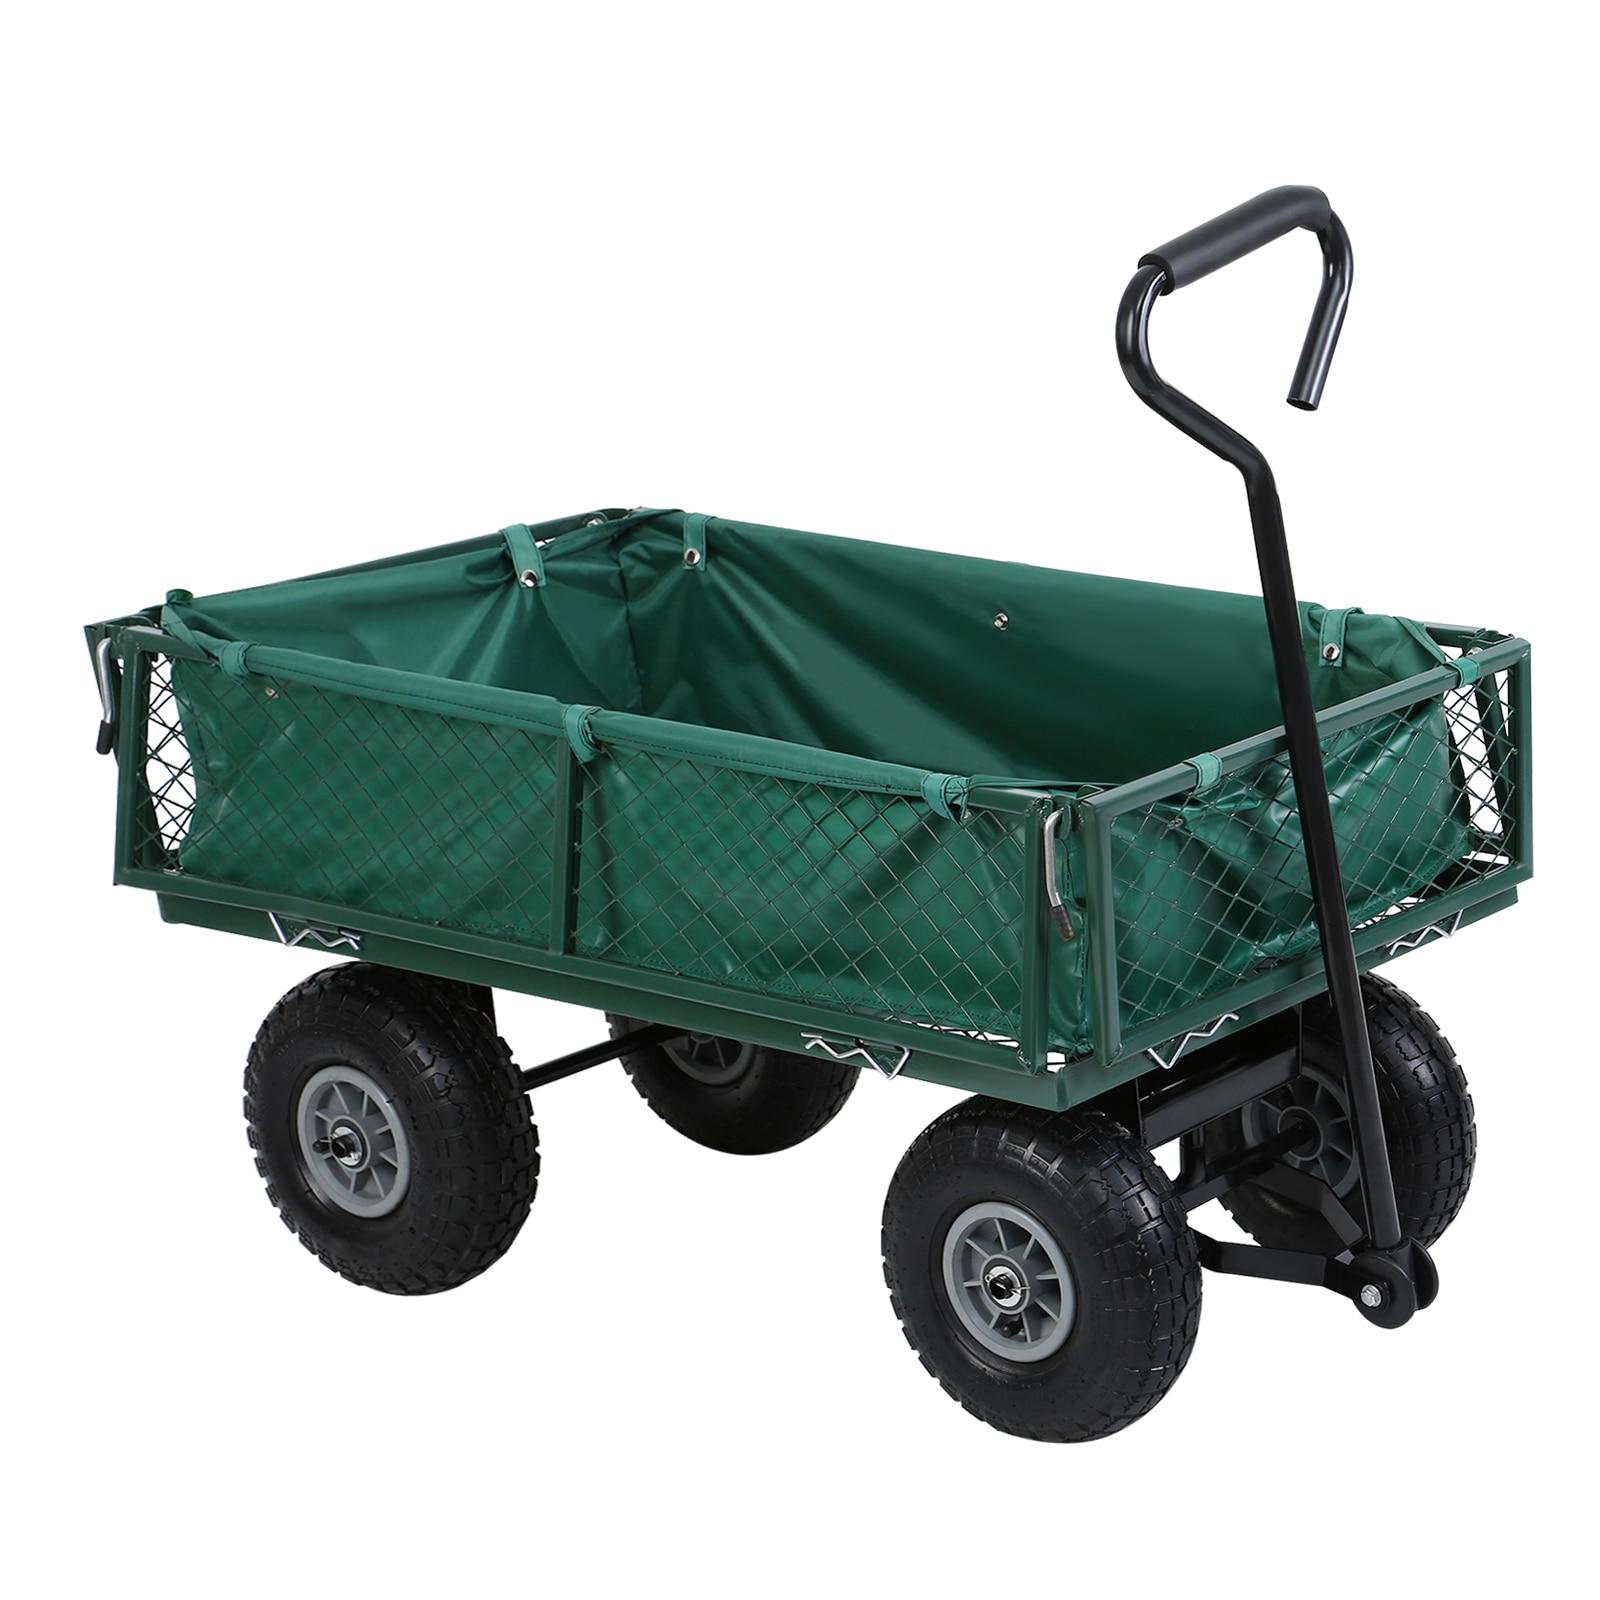 Yonntech Garten Shopping Trolley Wagon Warenkorb Lkw 4 Rad Pull Entlang Schubkarre Chariot de pliage Panier de wagon